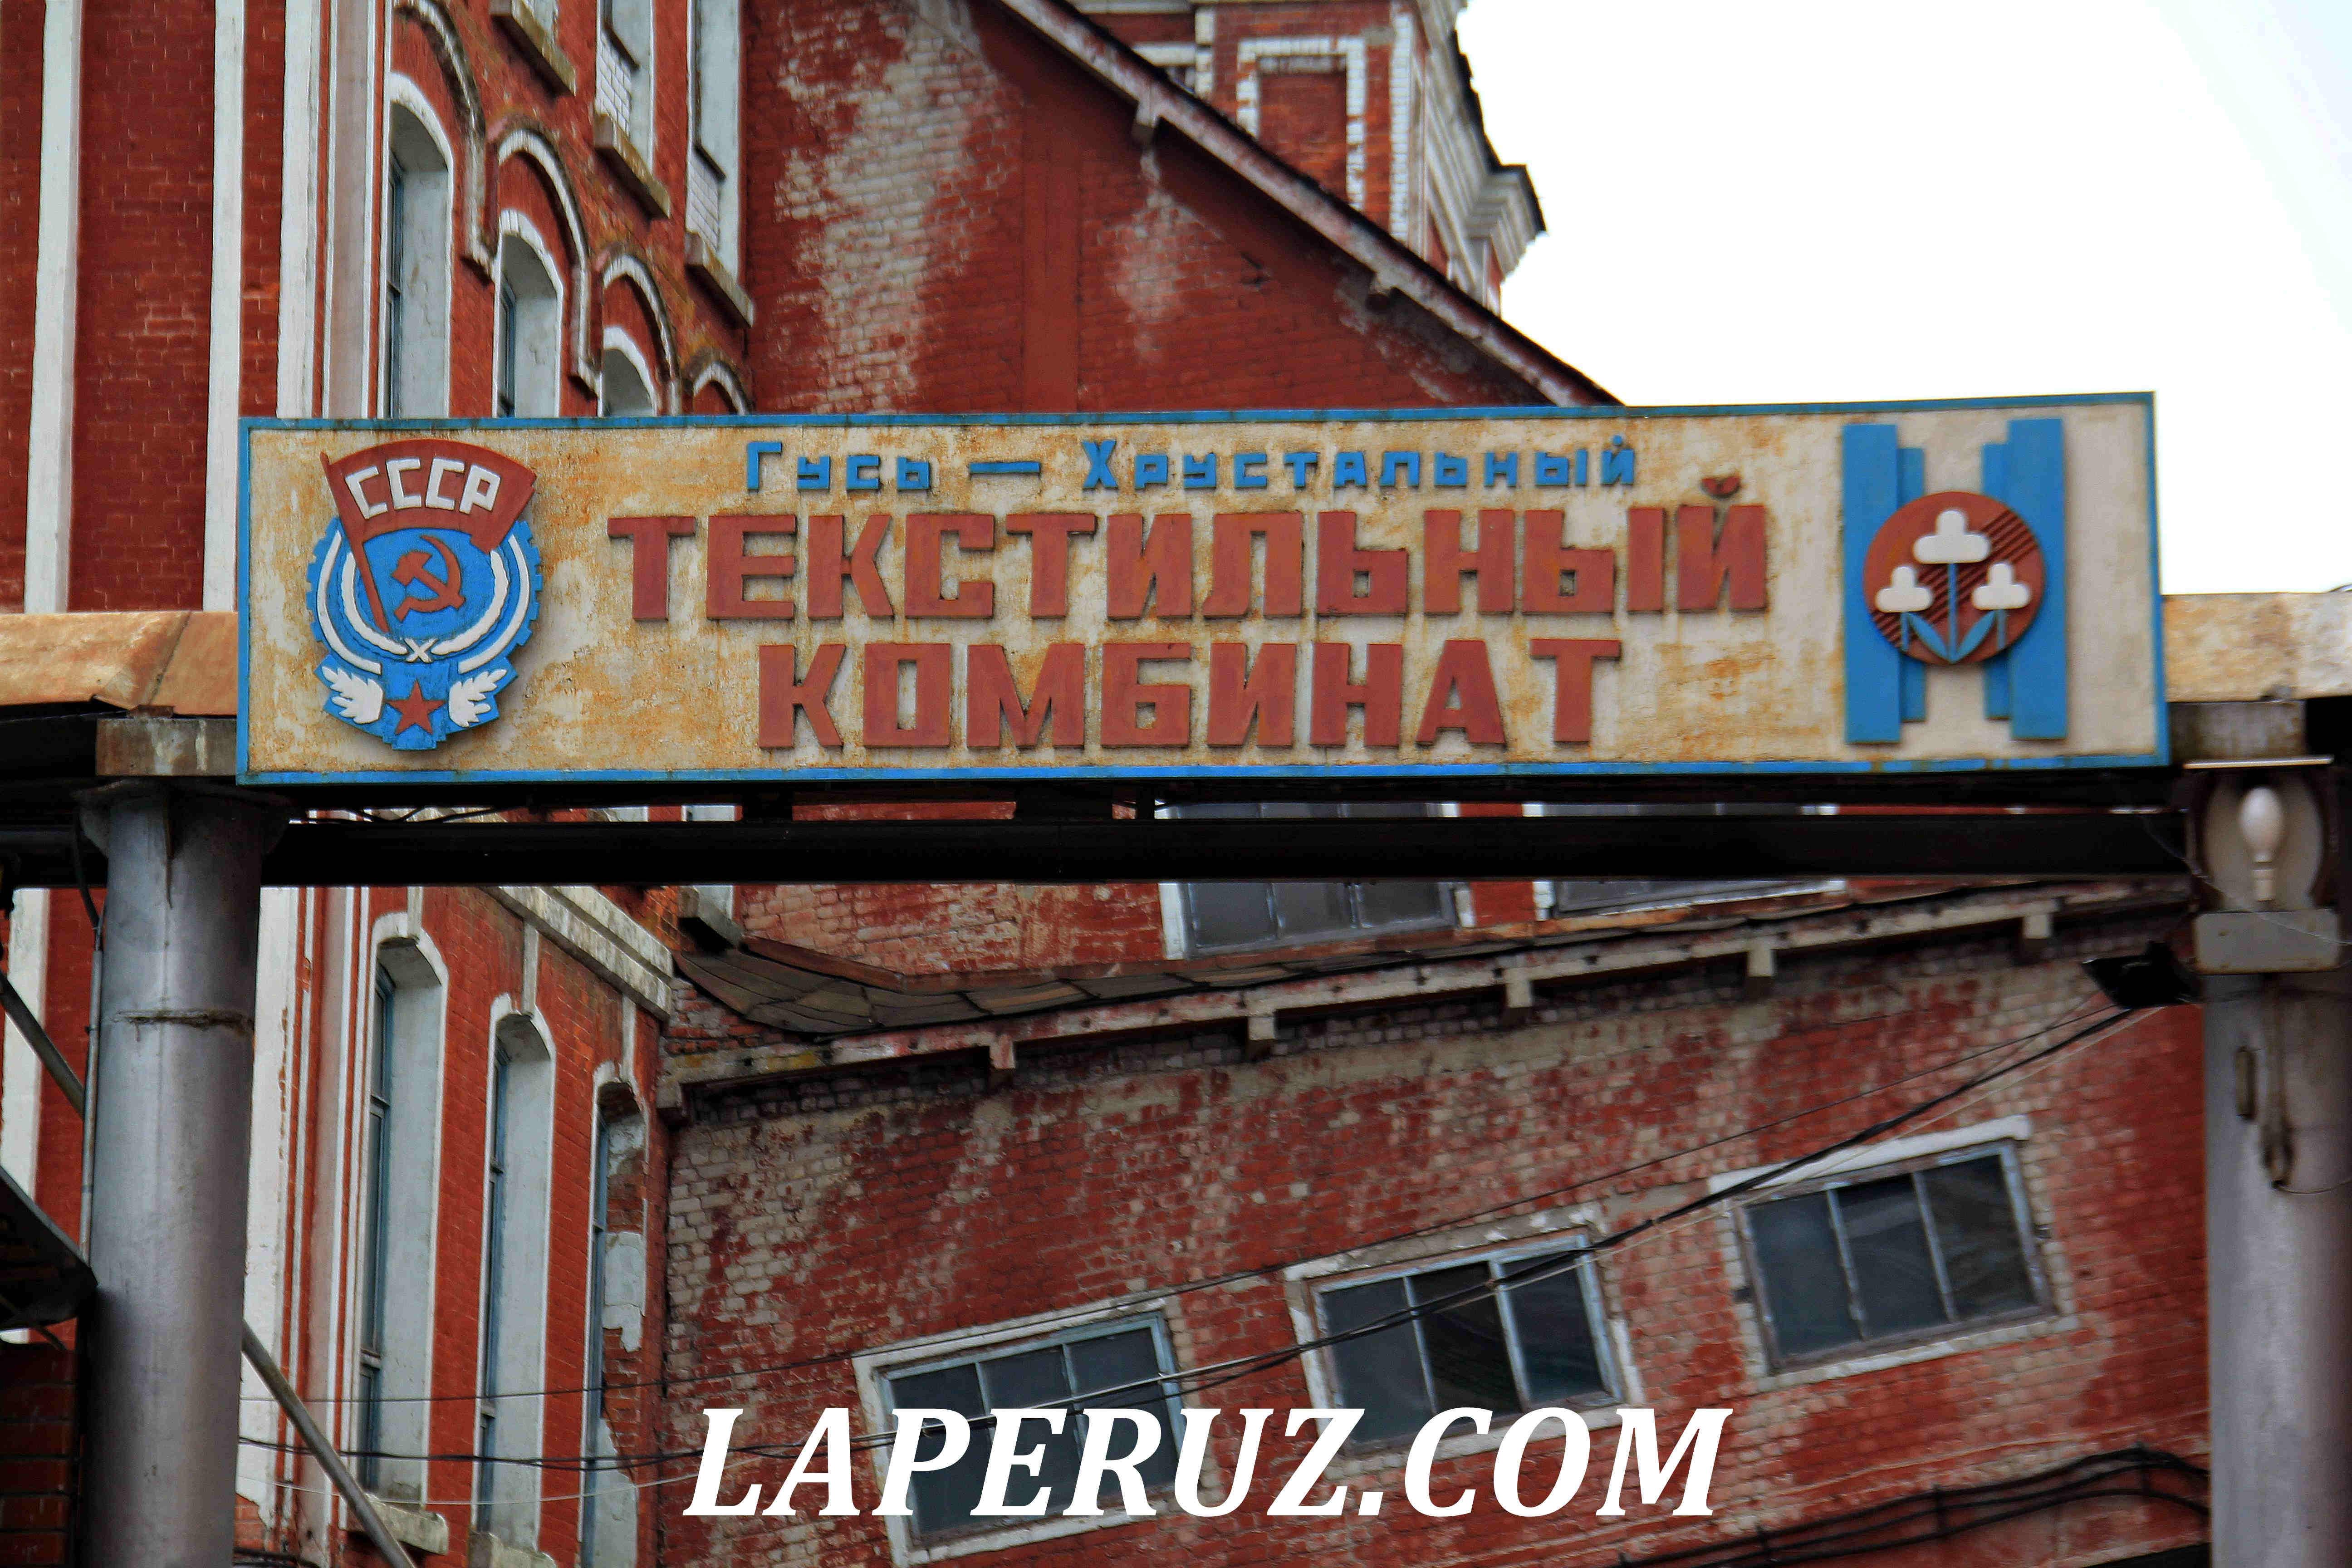 gus_hrustalnyi_textilnyi_kombinat_2